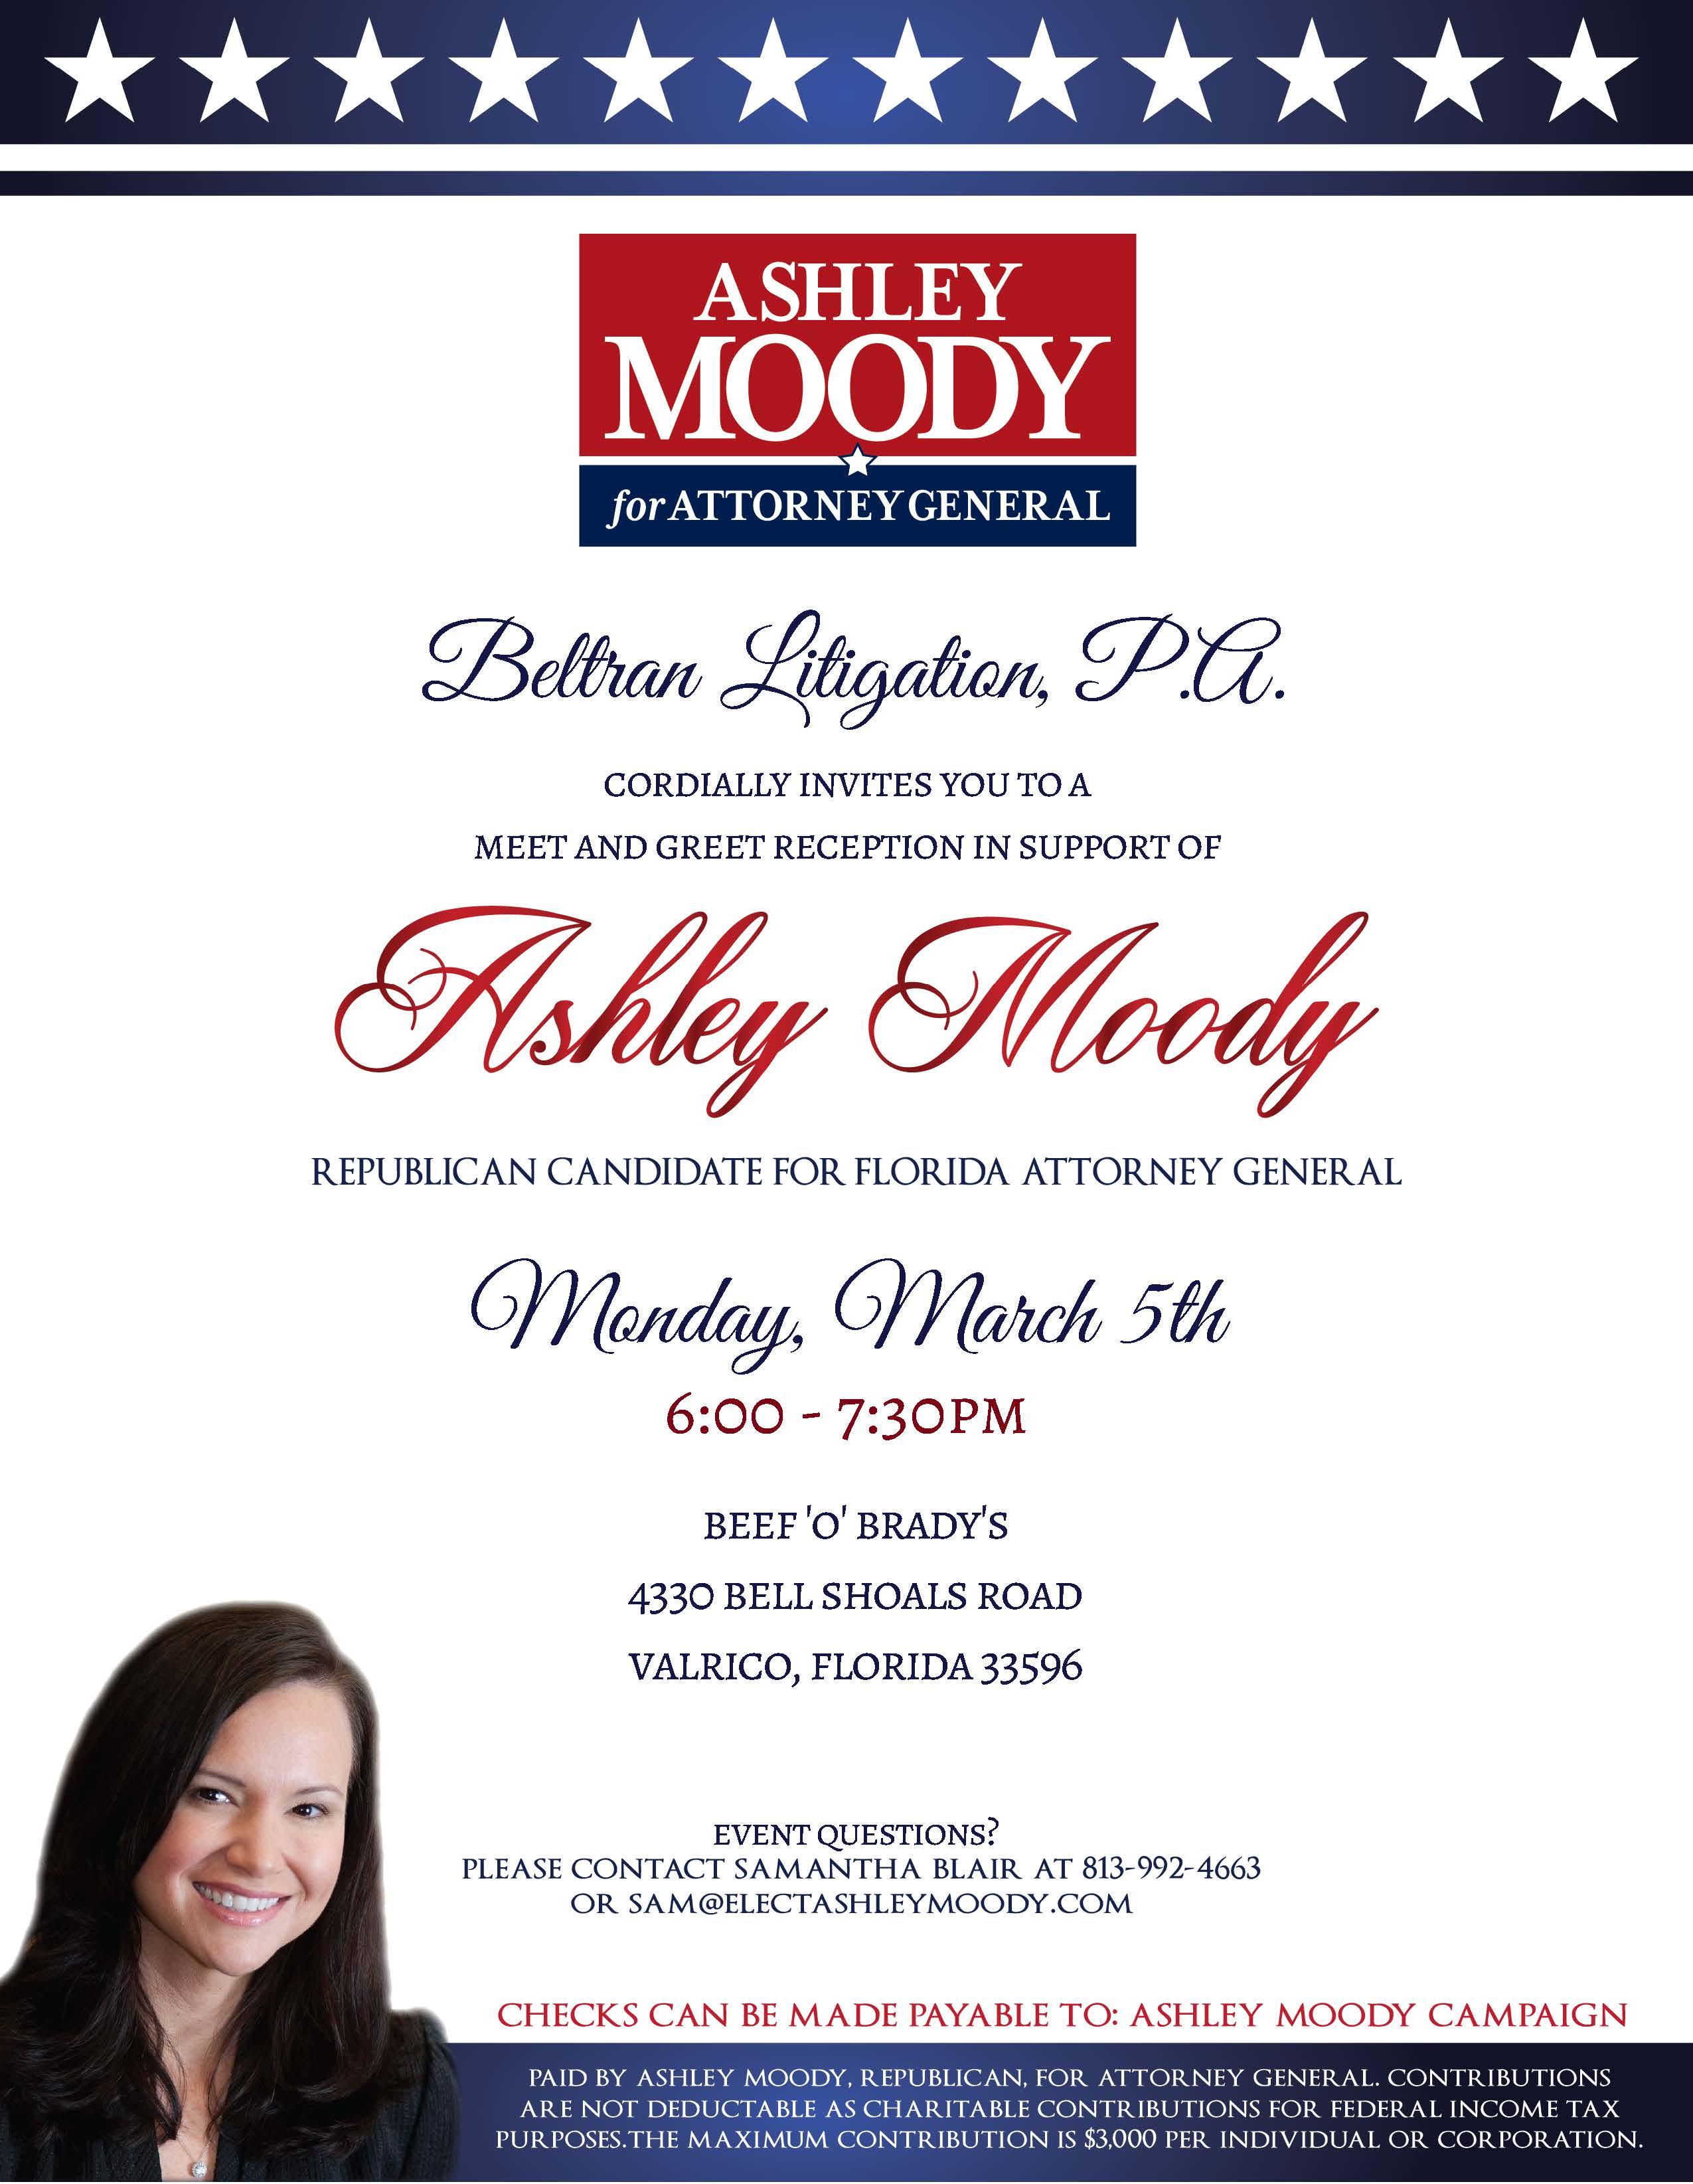 Beltran Litigation Pa Hosting Meet And Greet For Judge Ashley